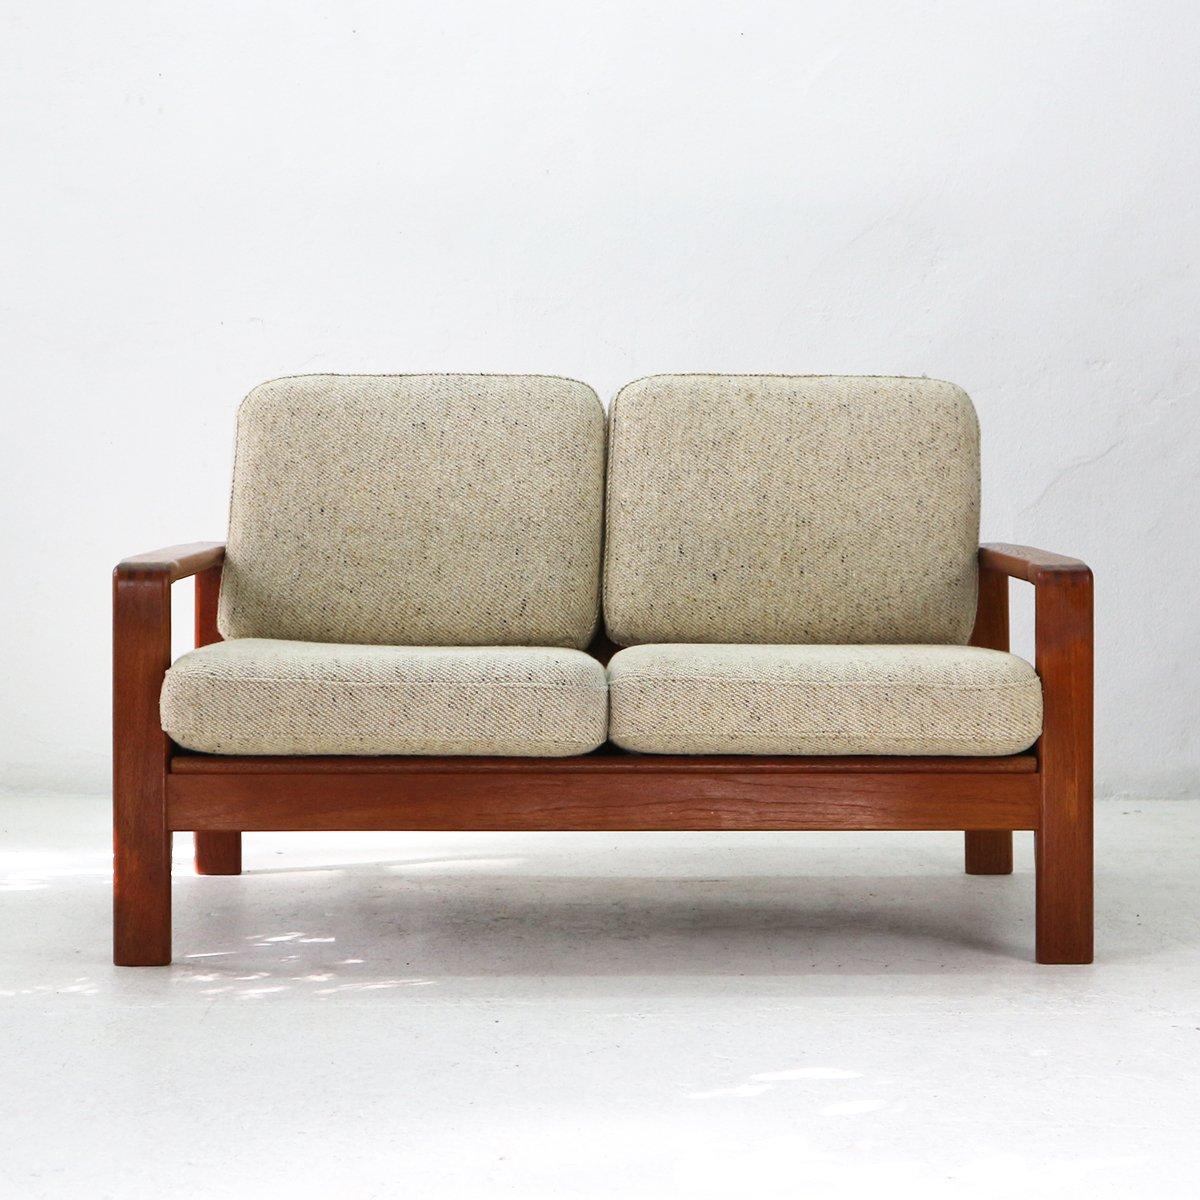 2 sitzer sofa aus teal wolle 1970er bei pamono kaufen. Black Bedroom Furniture Sets. Home Design Ideas